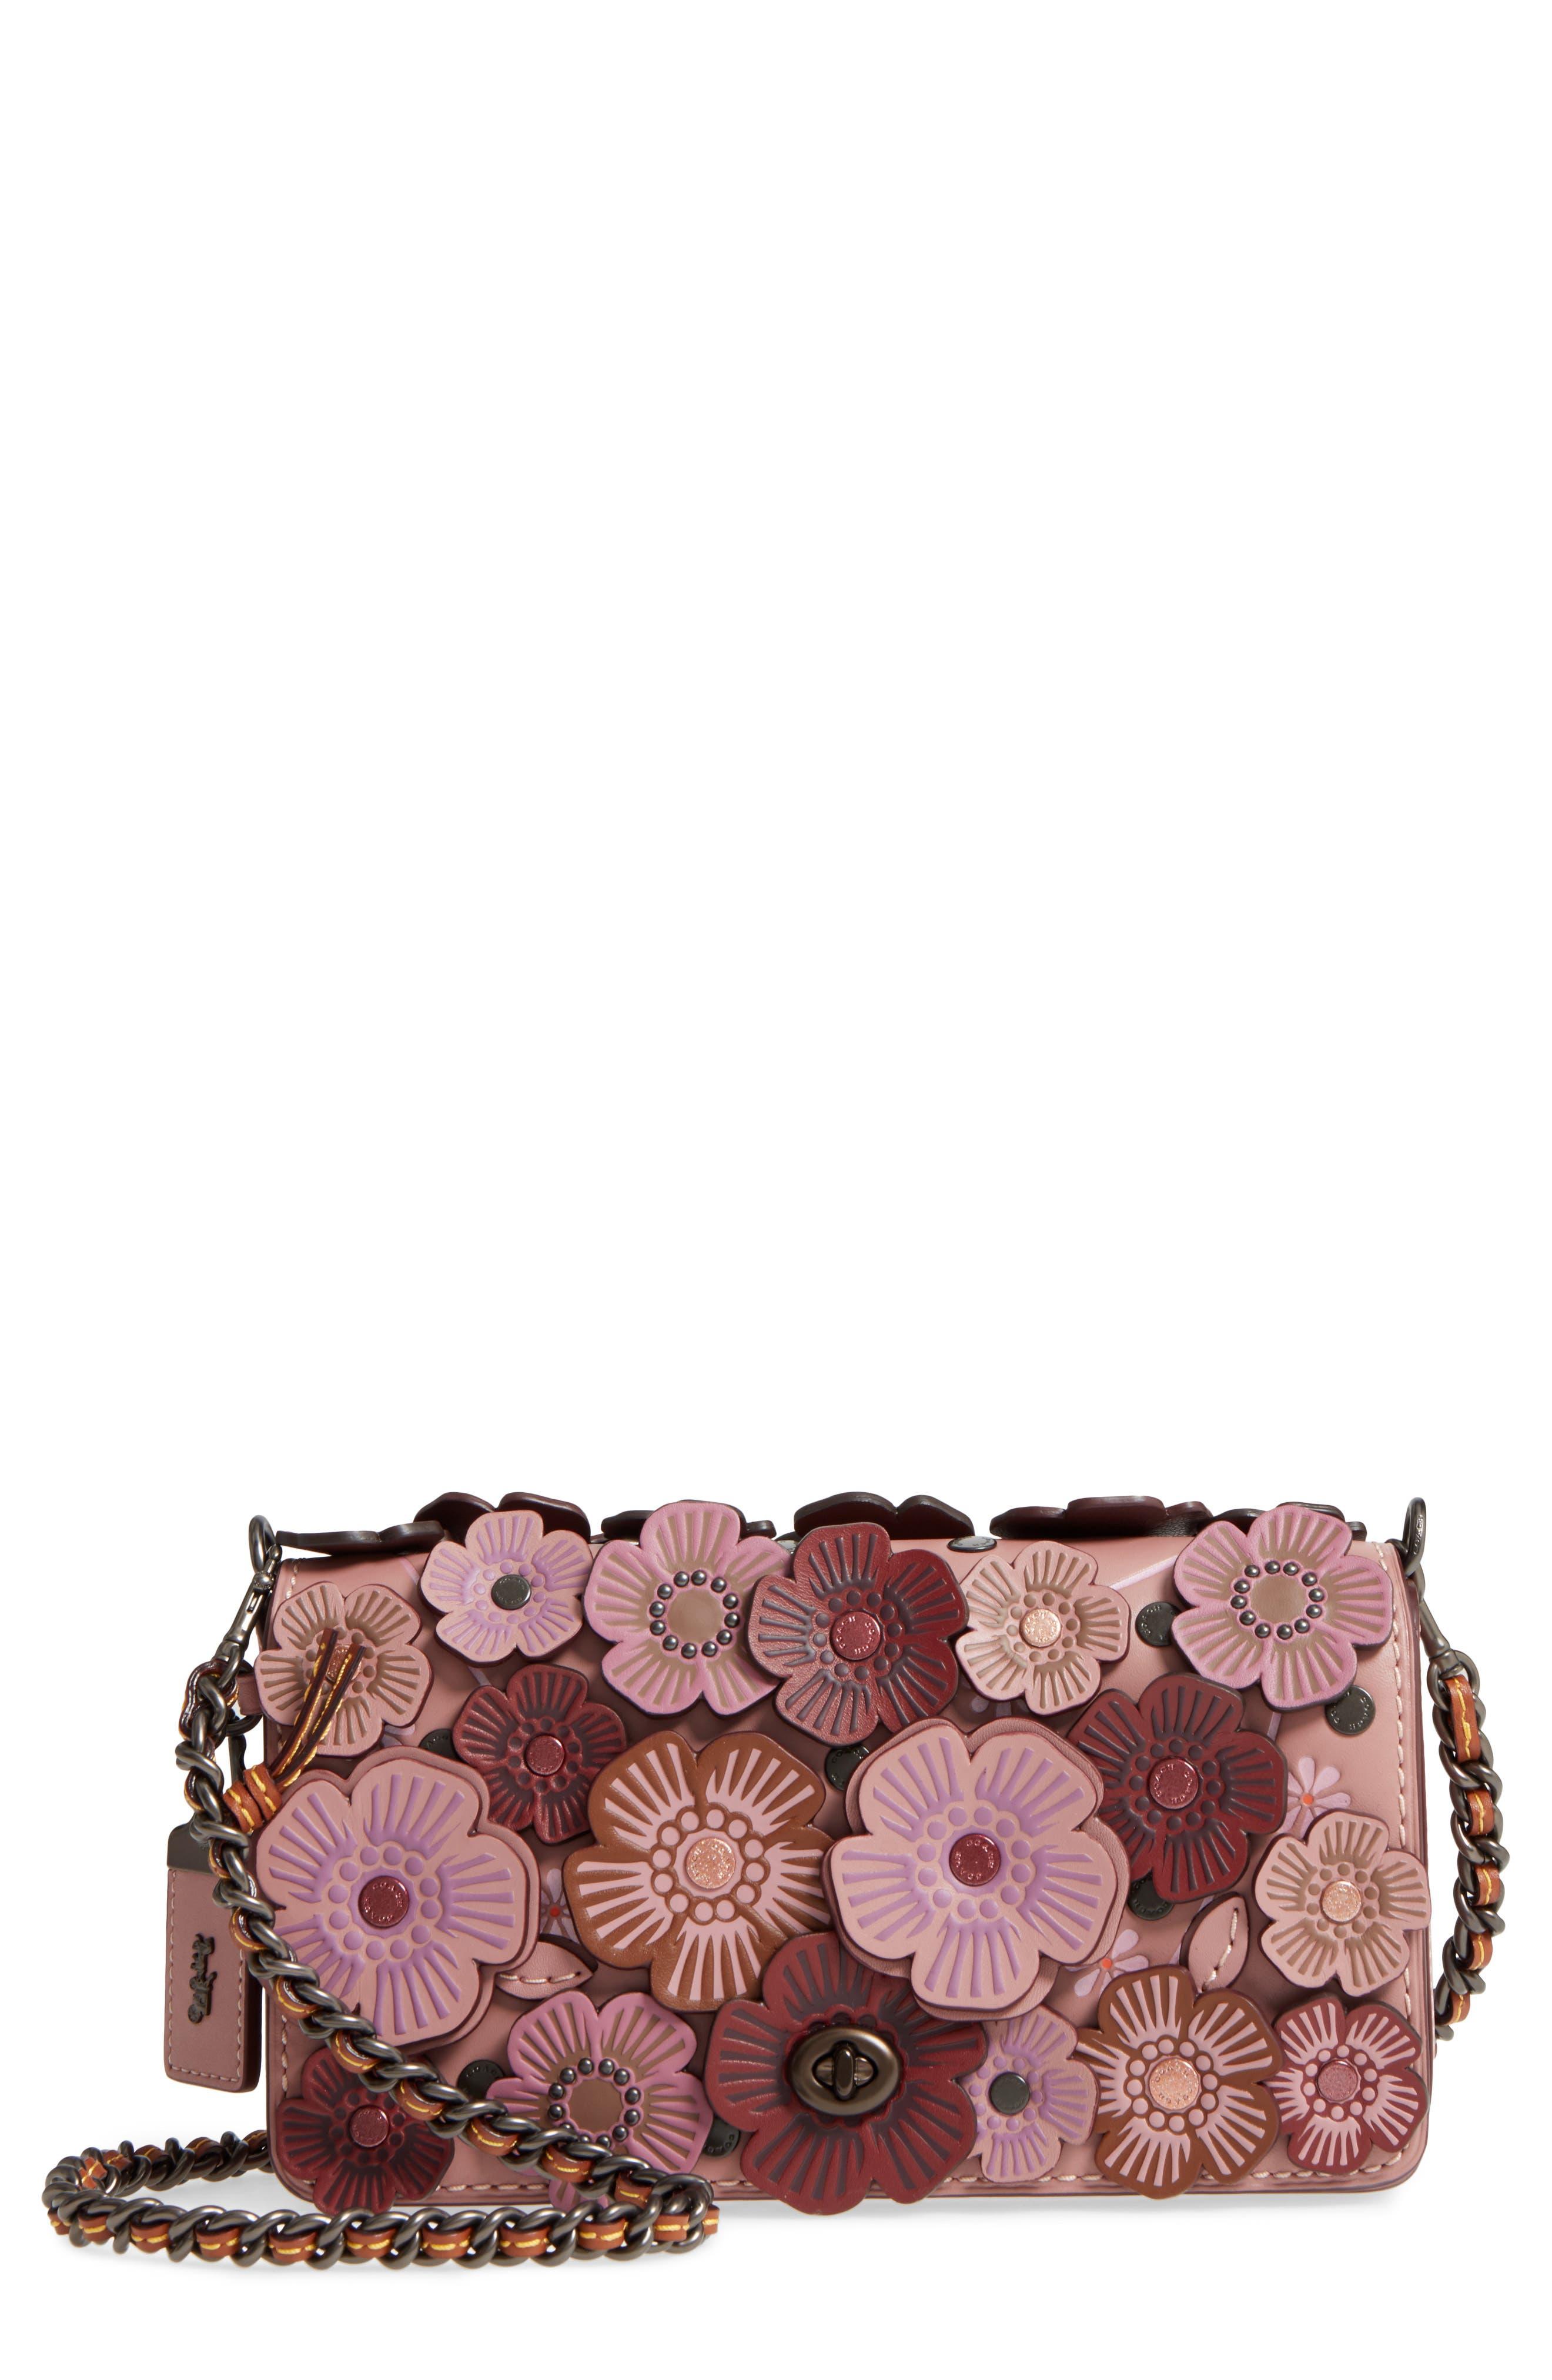 'Dinky' Flower Appliqué Leather Crossbody Bag,                             Main thumbnail 5, color,